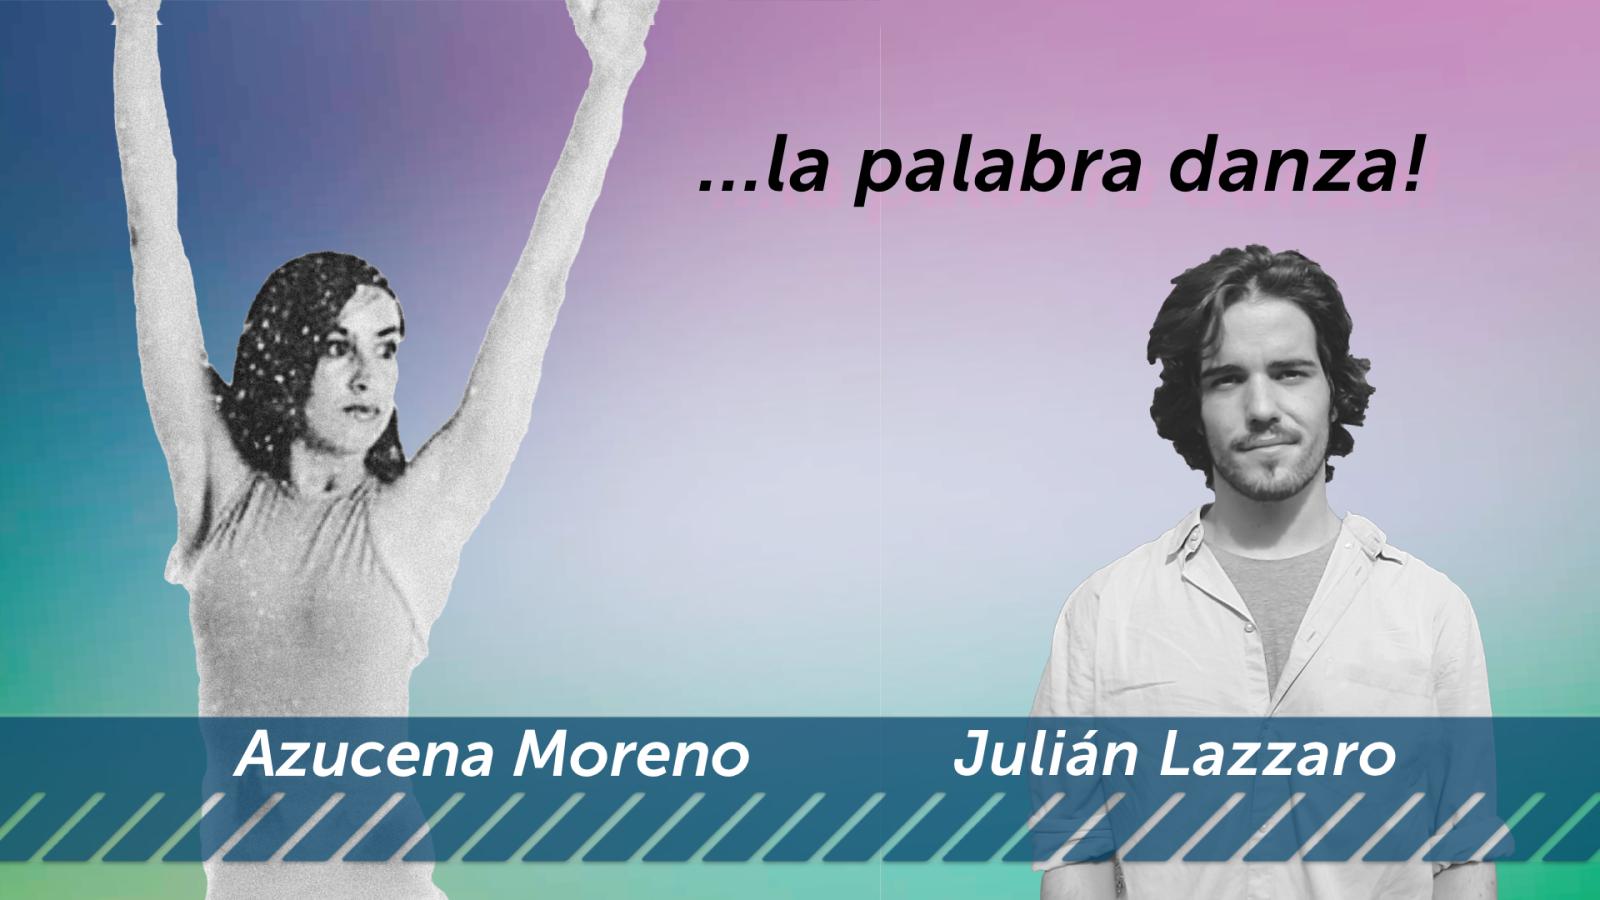 Buzón de Baile - ENTREGA - INTEGRIDAD